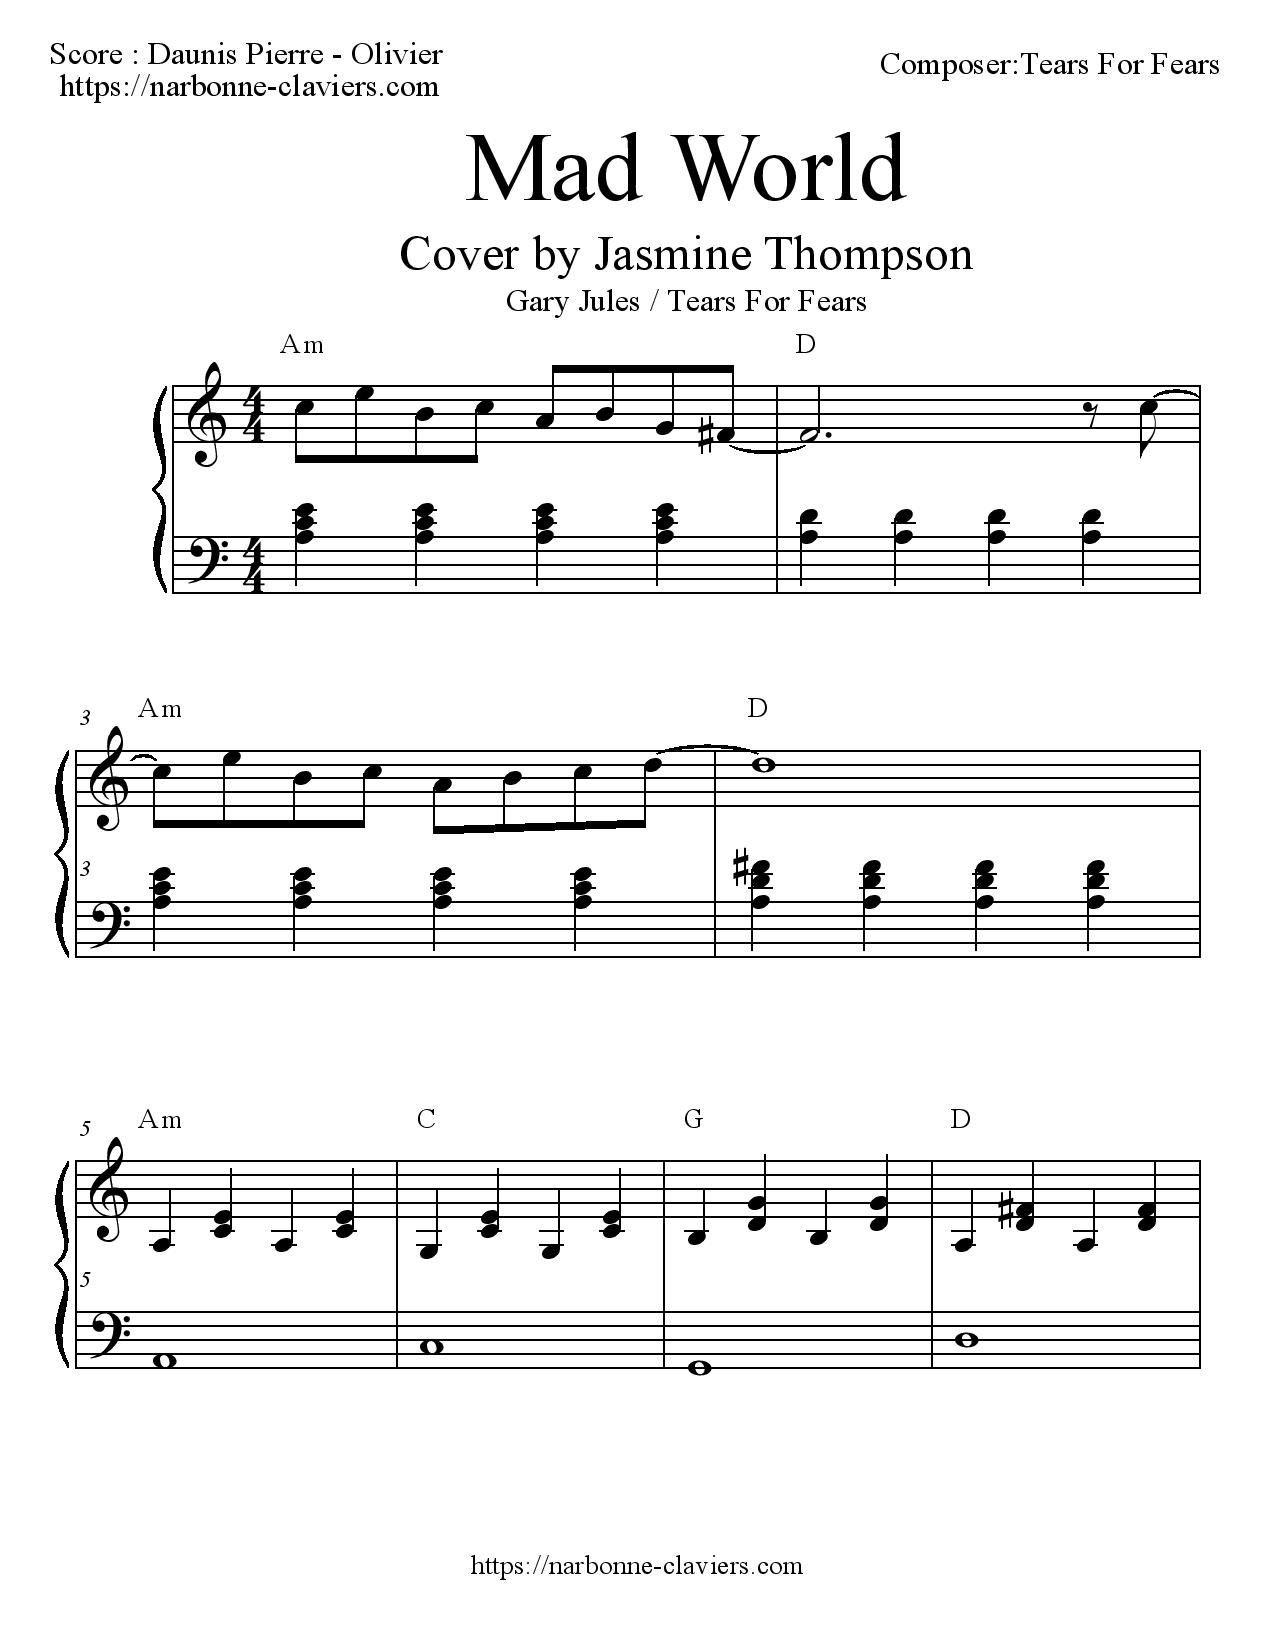 Mad World Chords At Mad World Jasmine Thompson Chords Mens Esjob